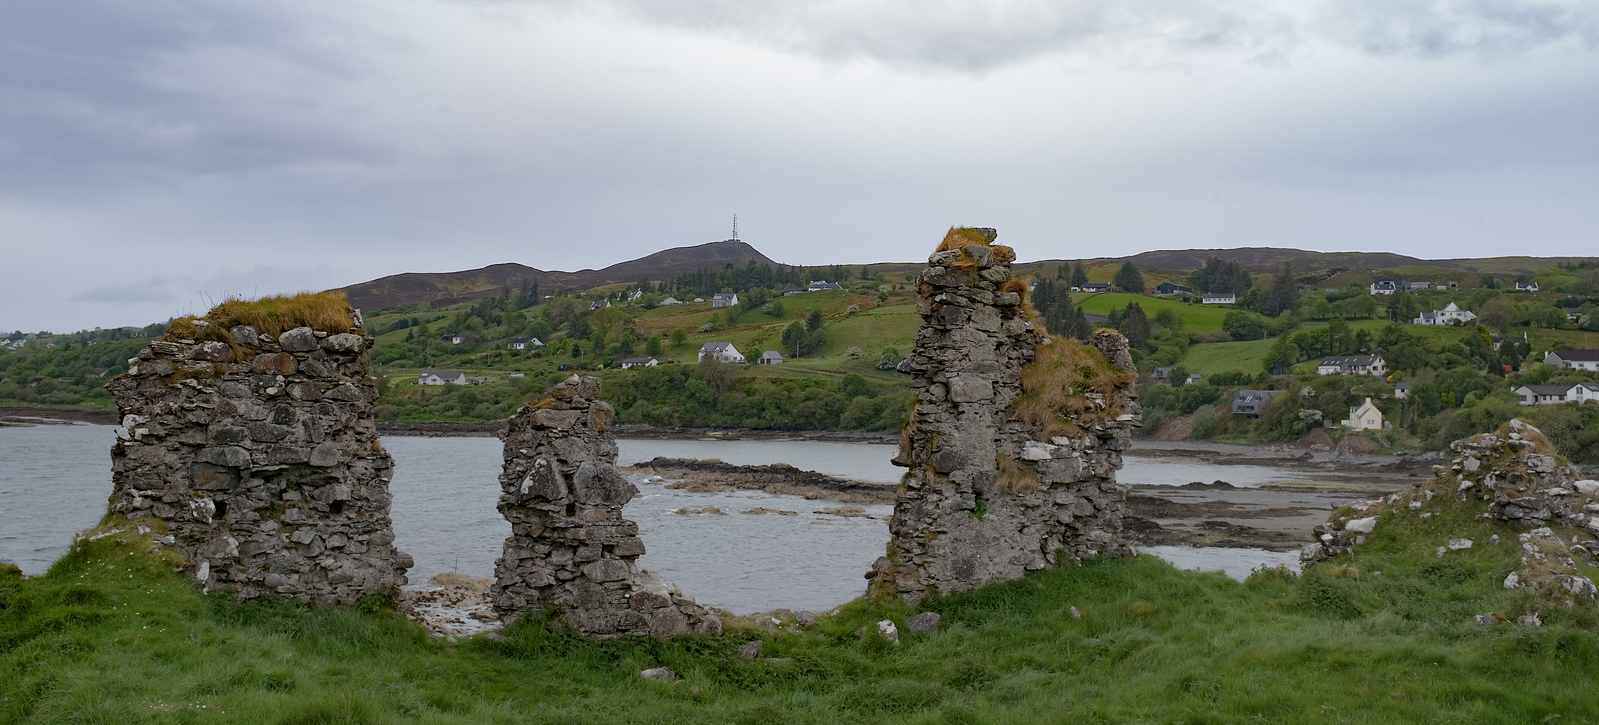 Knock  Castle Teangue Isle of Skye May 2017